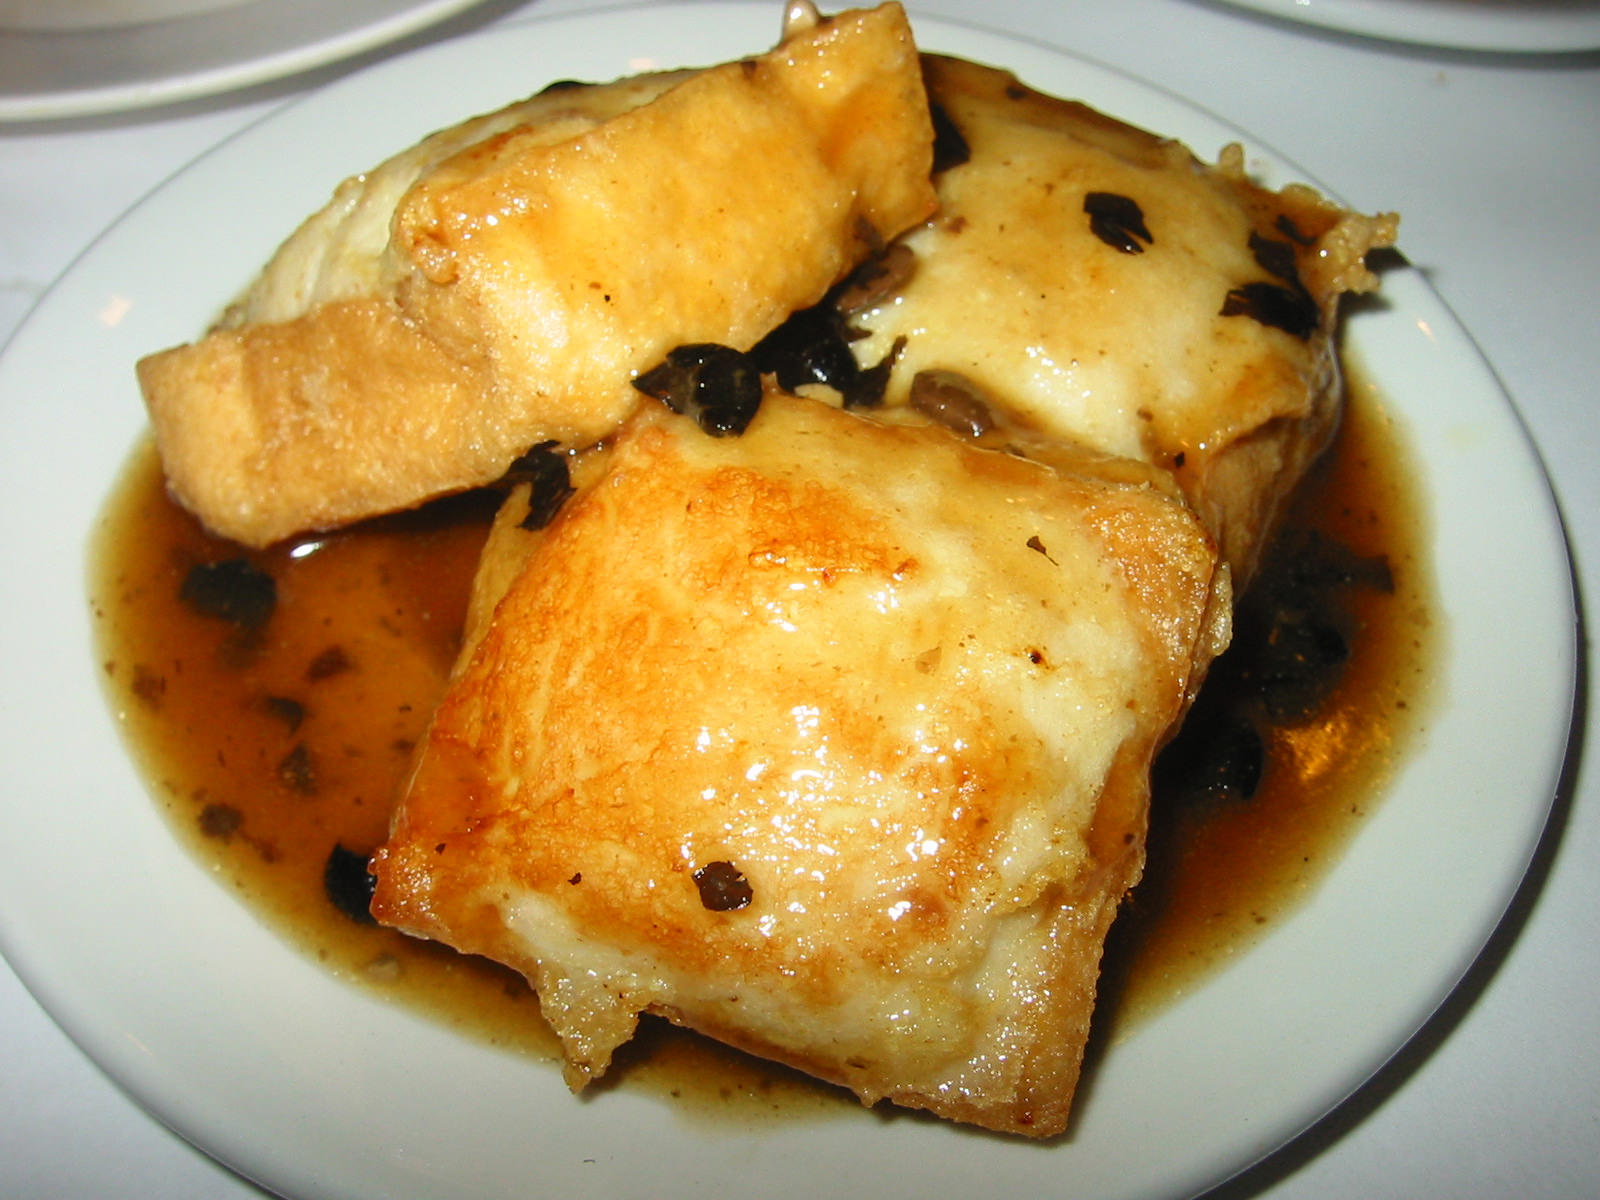 Stuffed tofu with black bean sauce